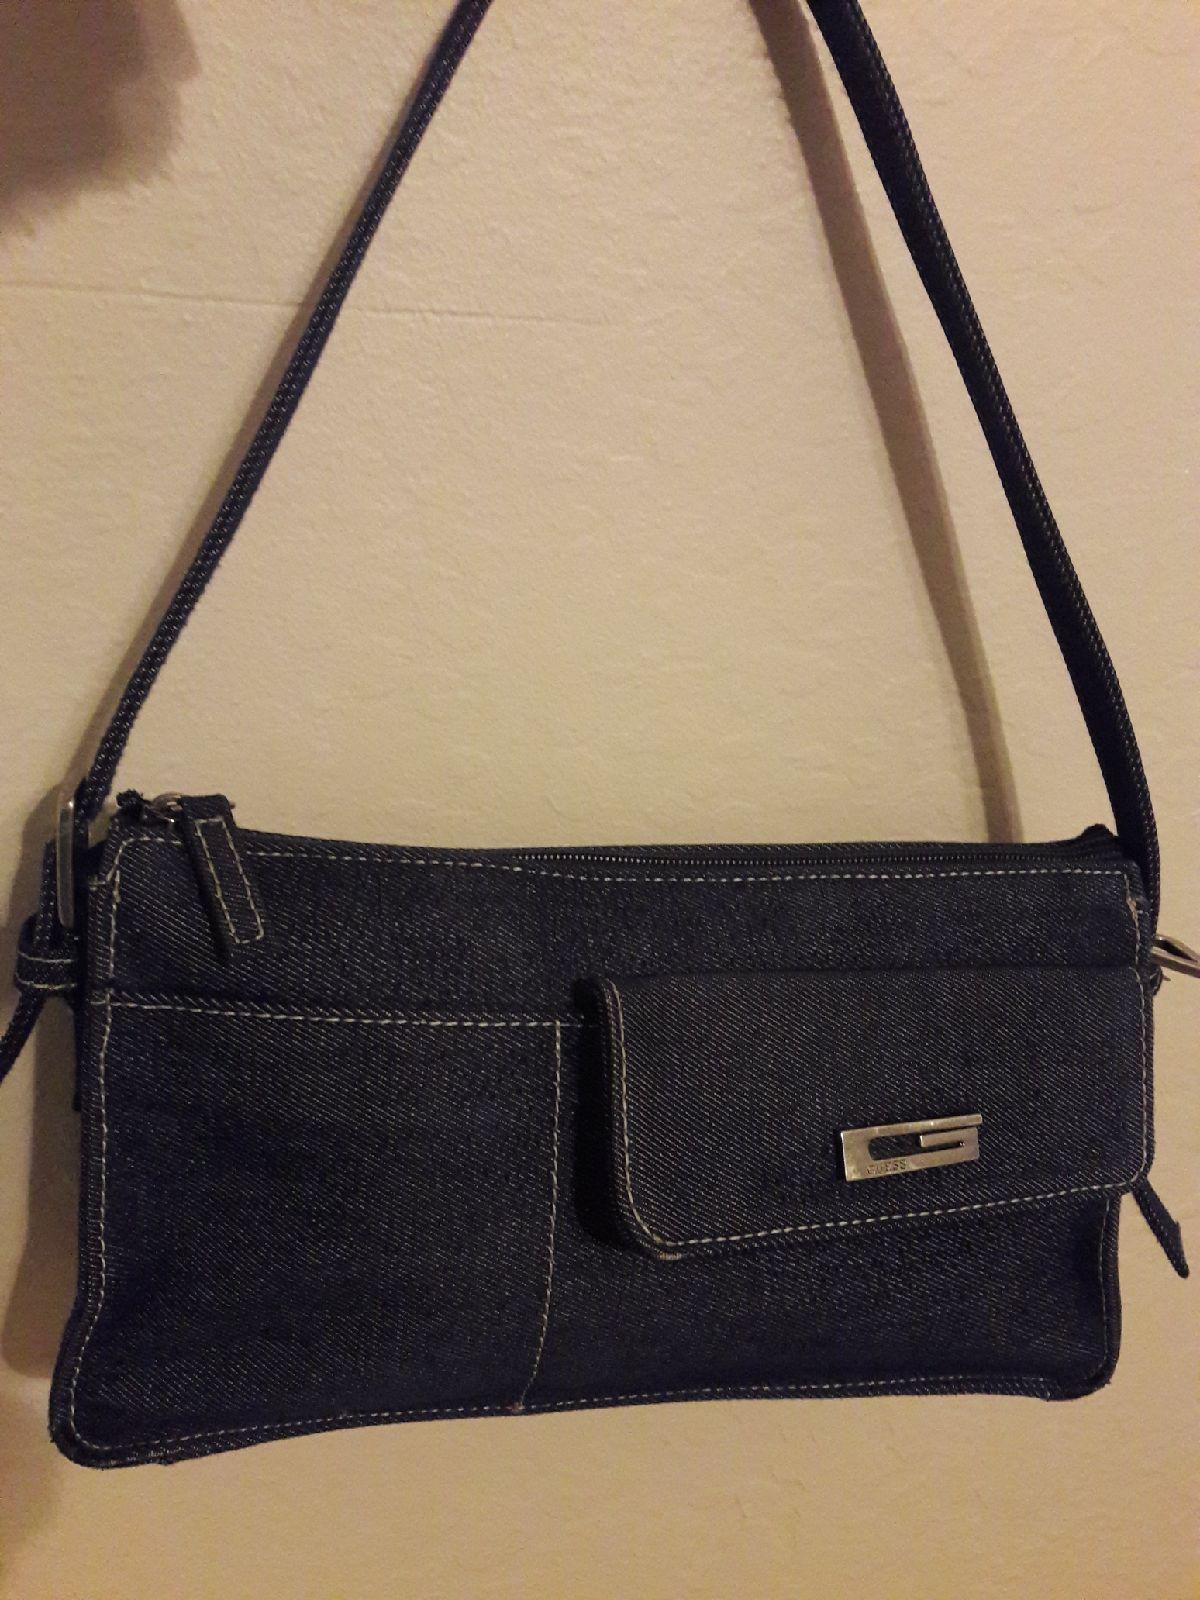 Guess Women Denim Handbag Carry Bag